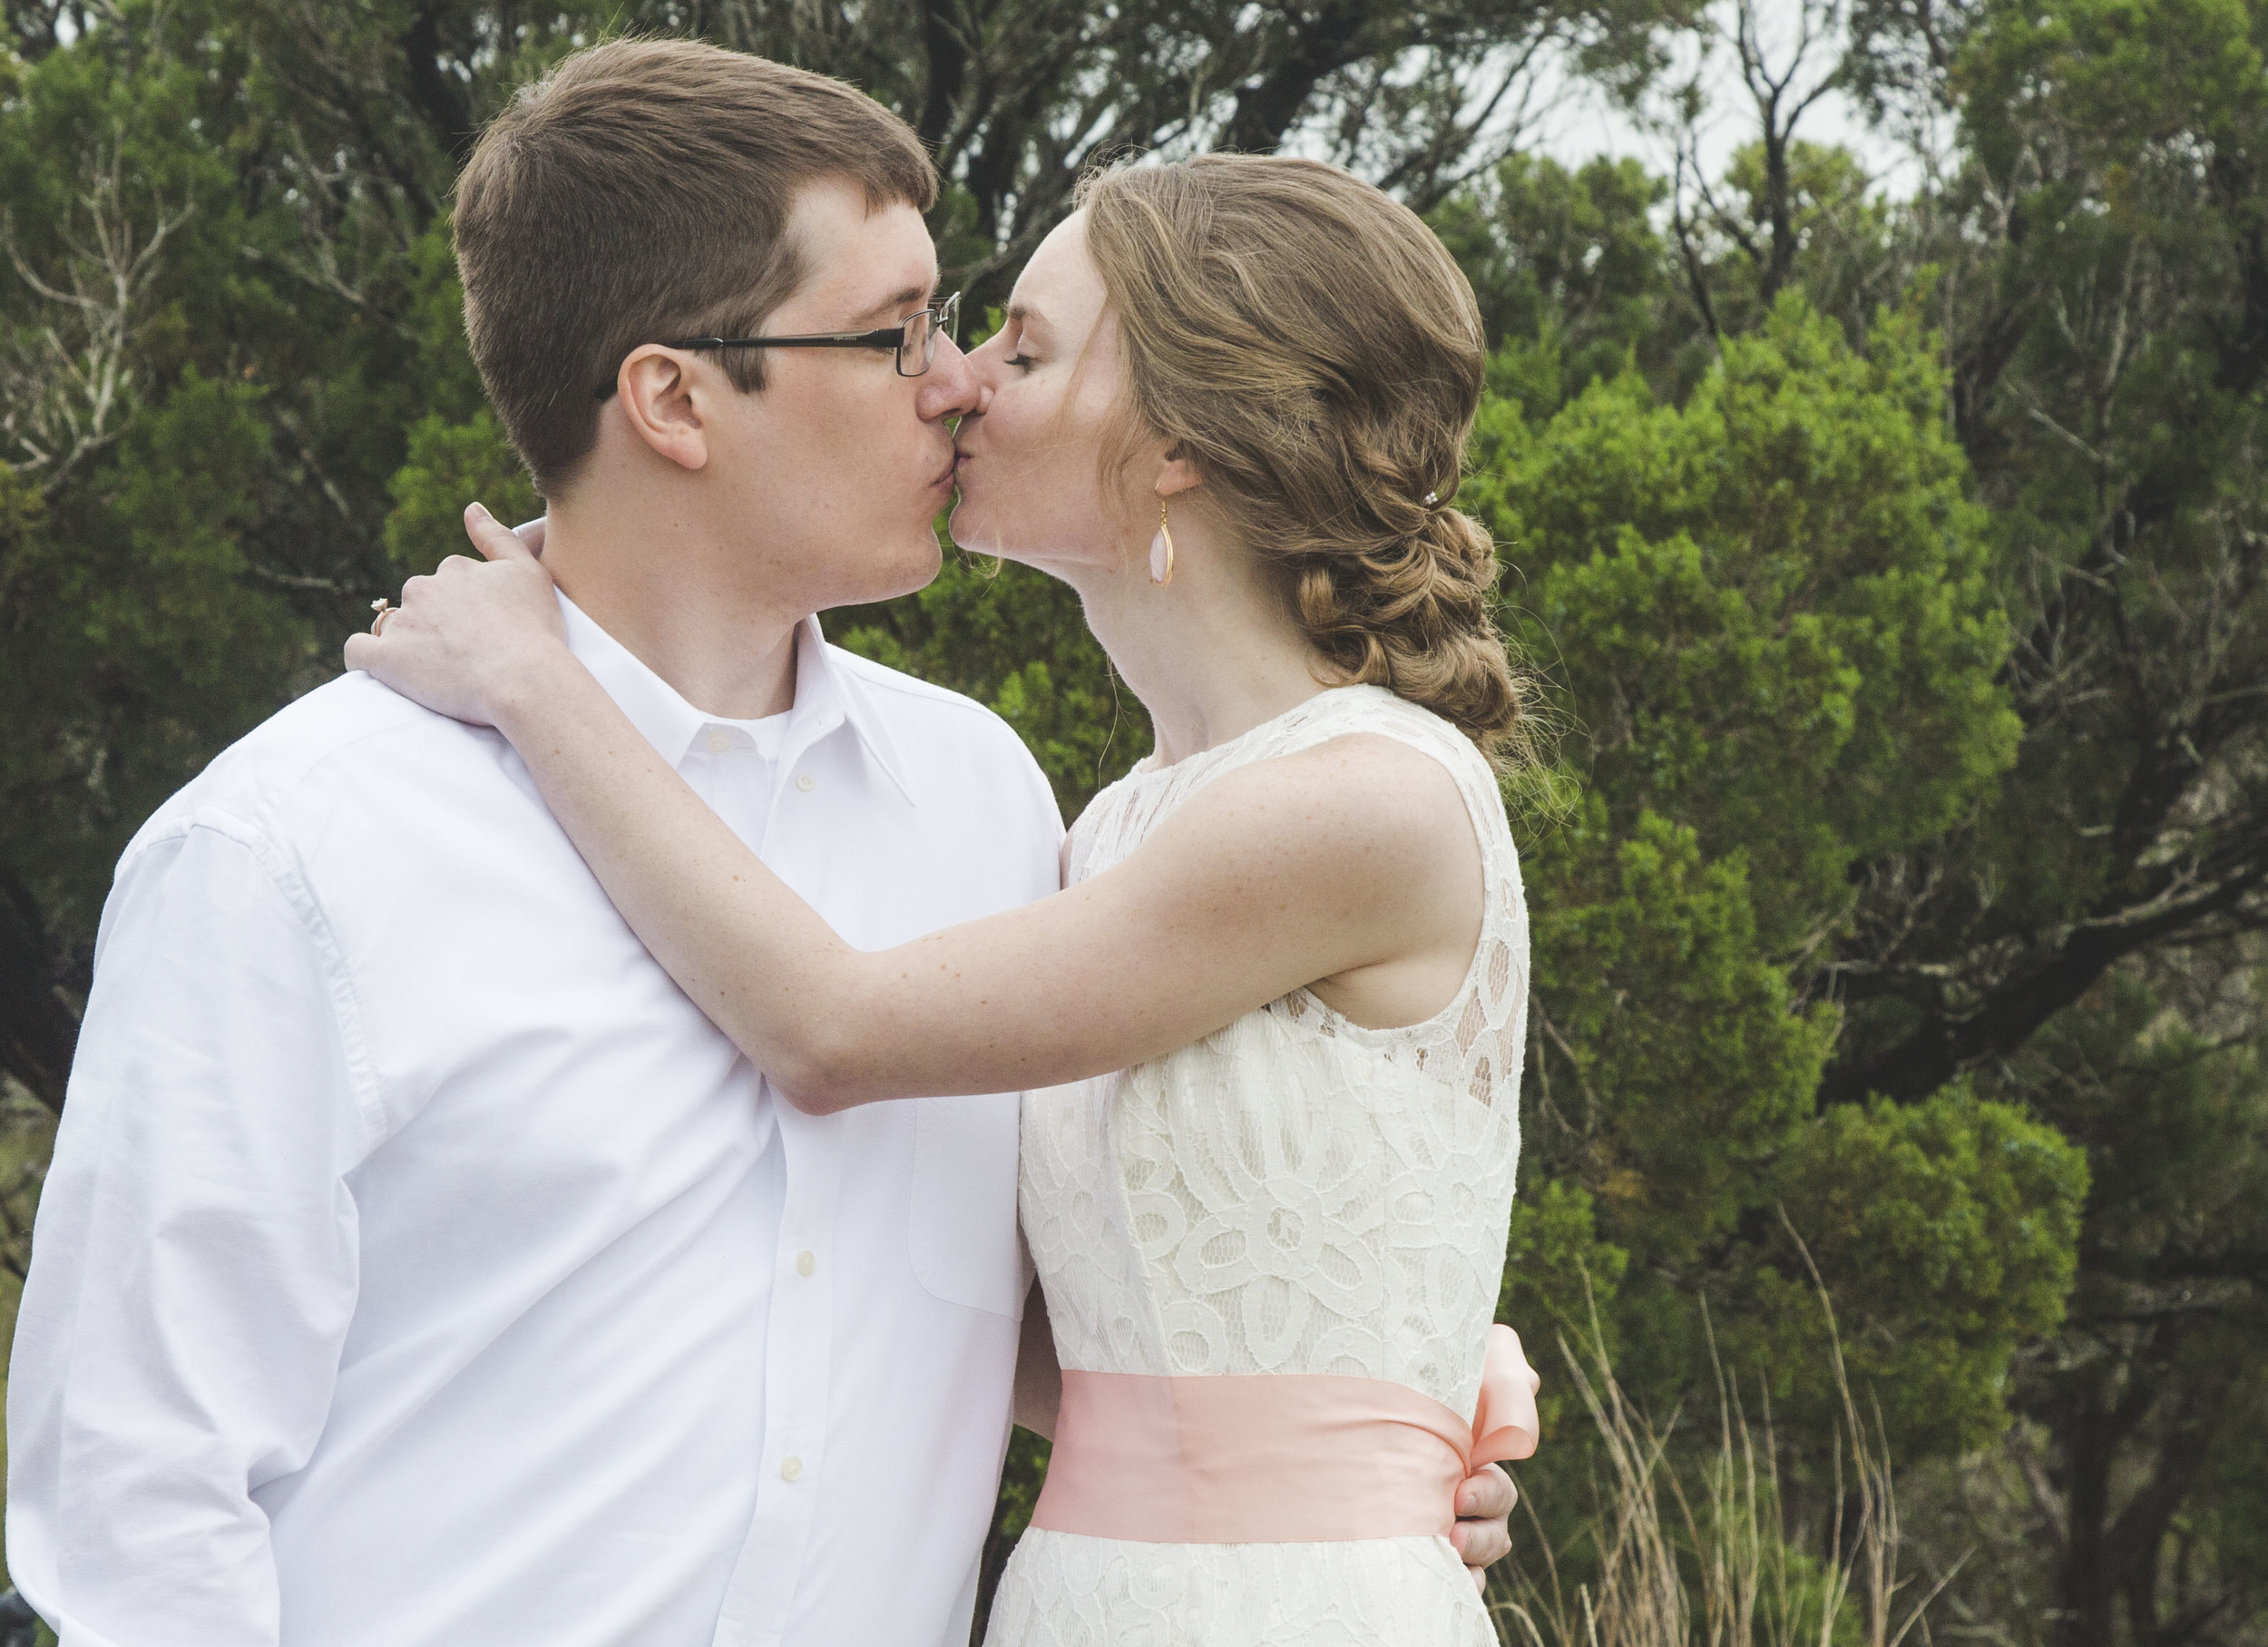 ATGI_Nicole & Patrick Wedding_2016_2S8A6529.jpg